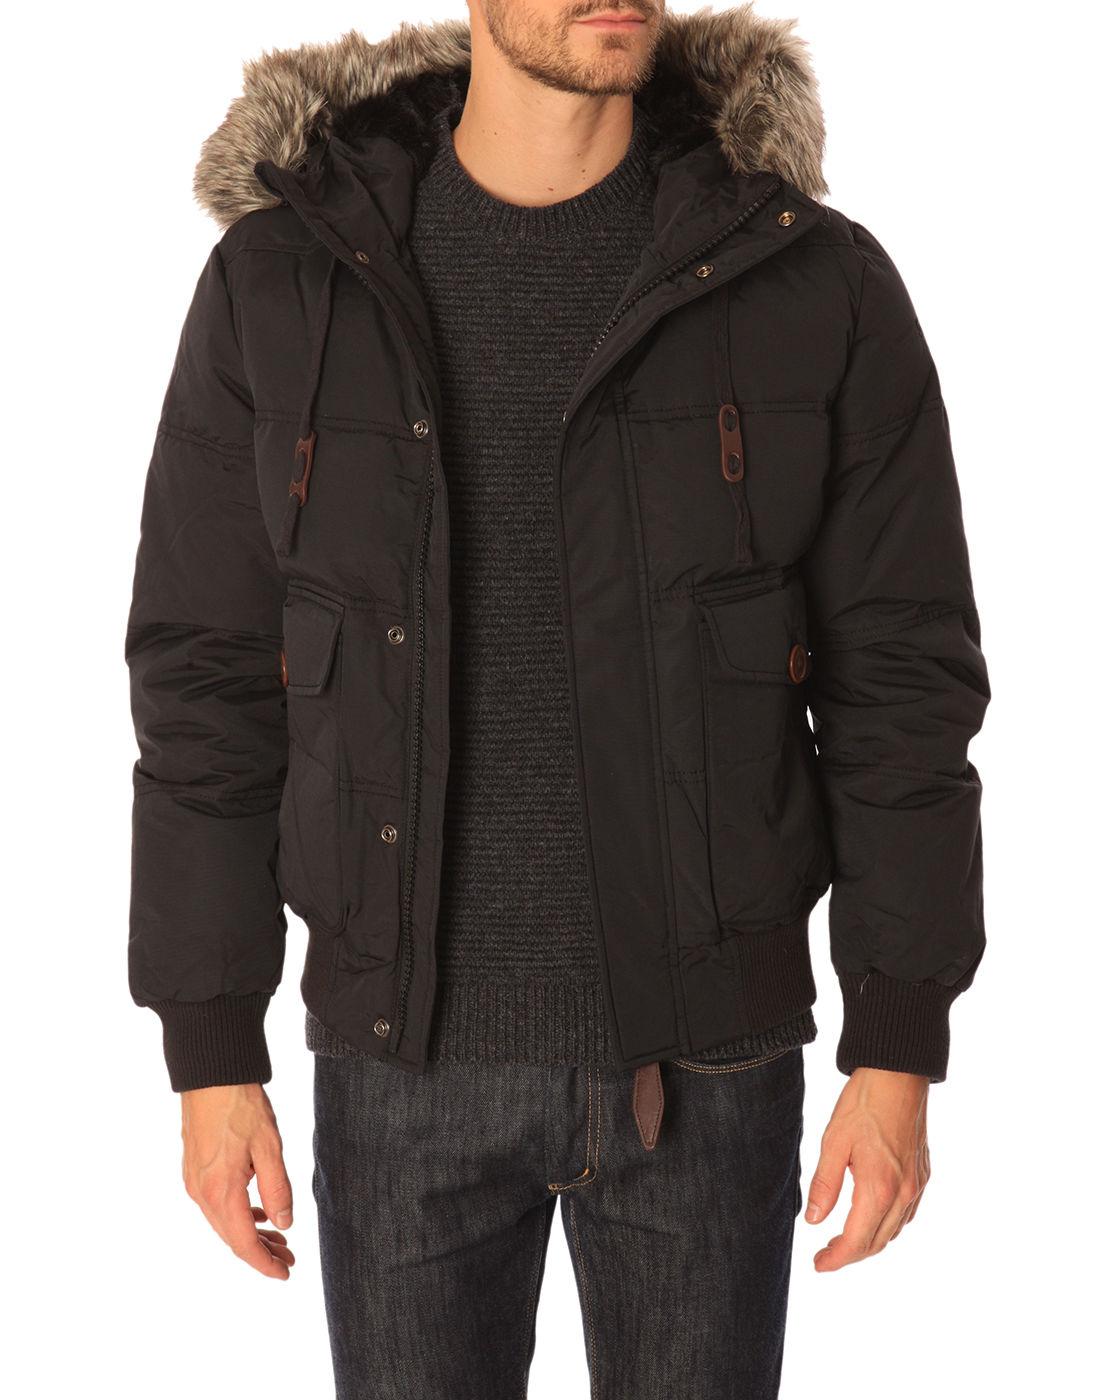 schott nyc thunder hooded bomber jacket with detachable fur trim in black for men lyst. Black Bedroom Furniture Sets. Home Design Ideas